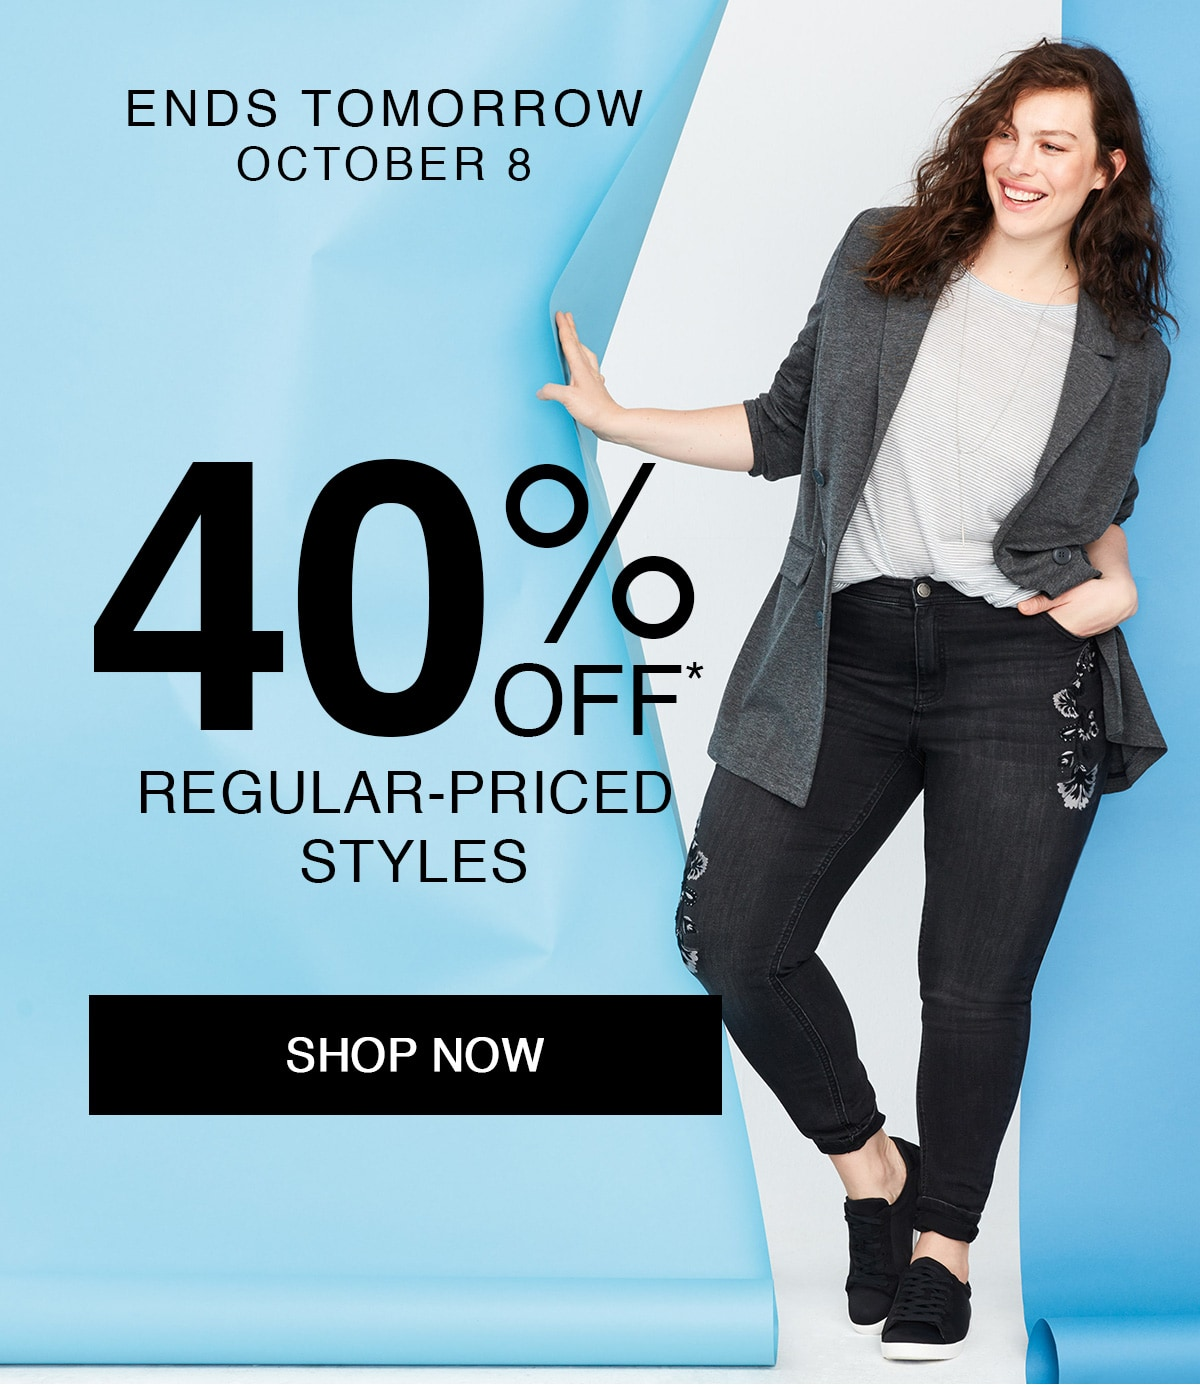 40% off* regular-priced styles